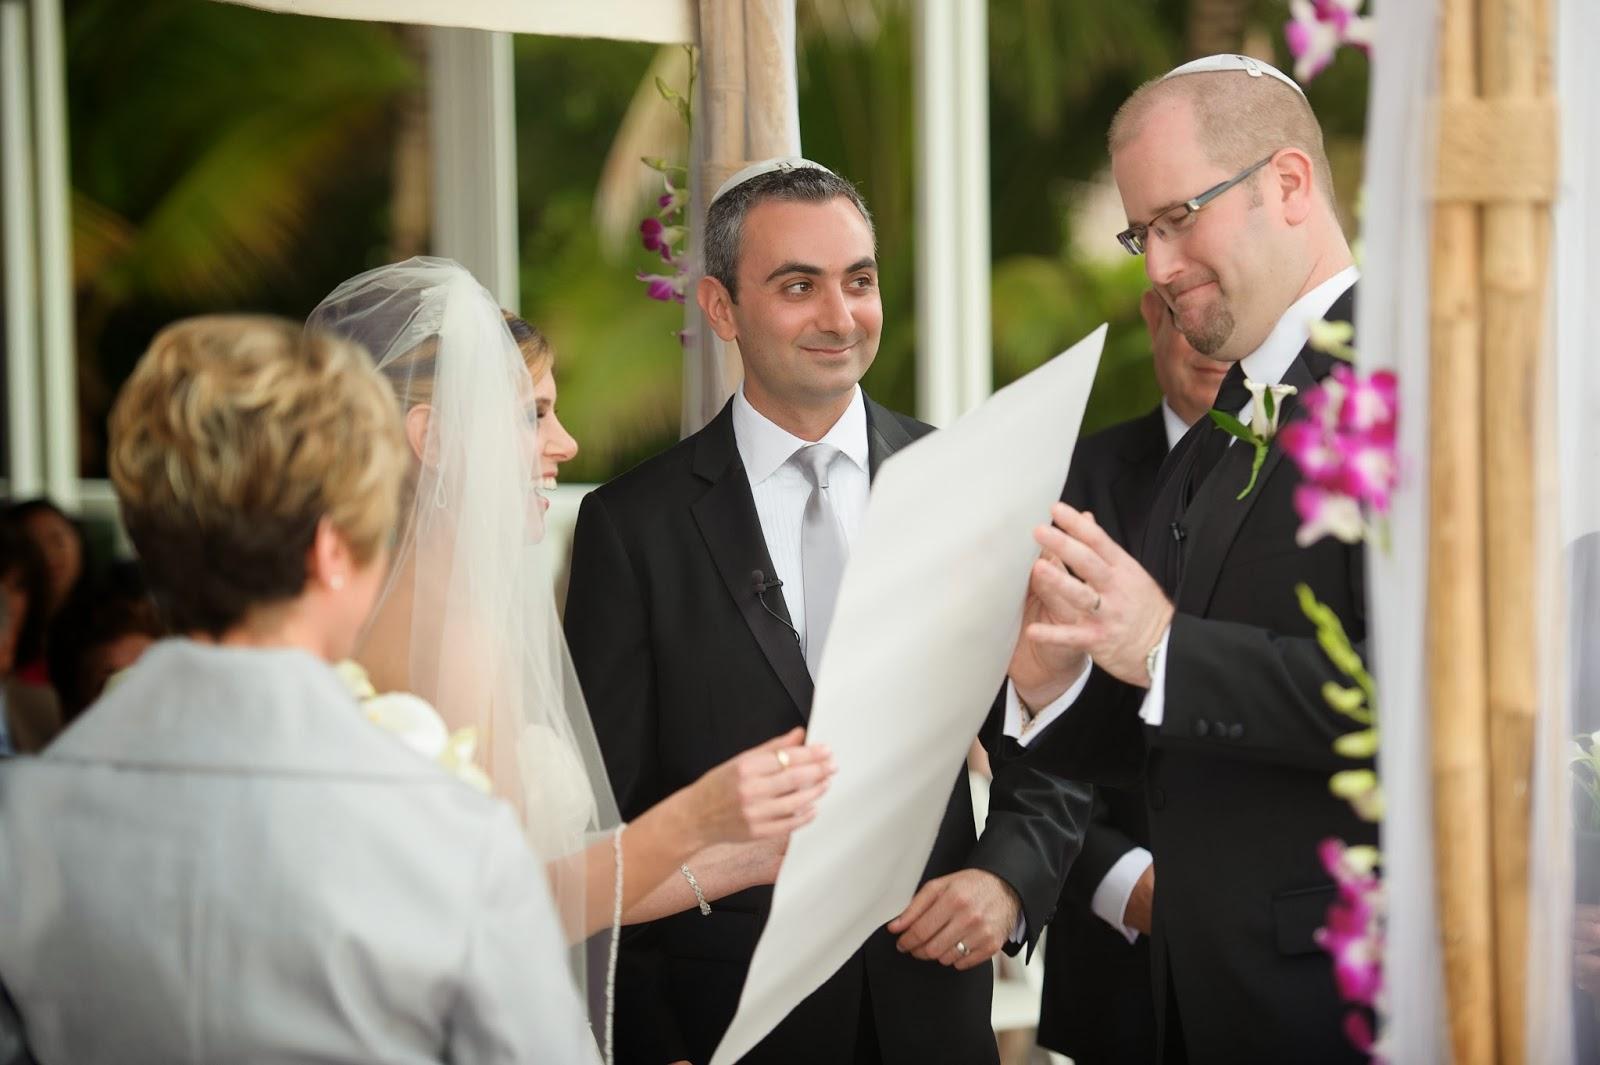 Rabbi for Wedding - Jewish Weddings - Rabbi Jason Miller